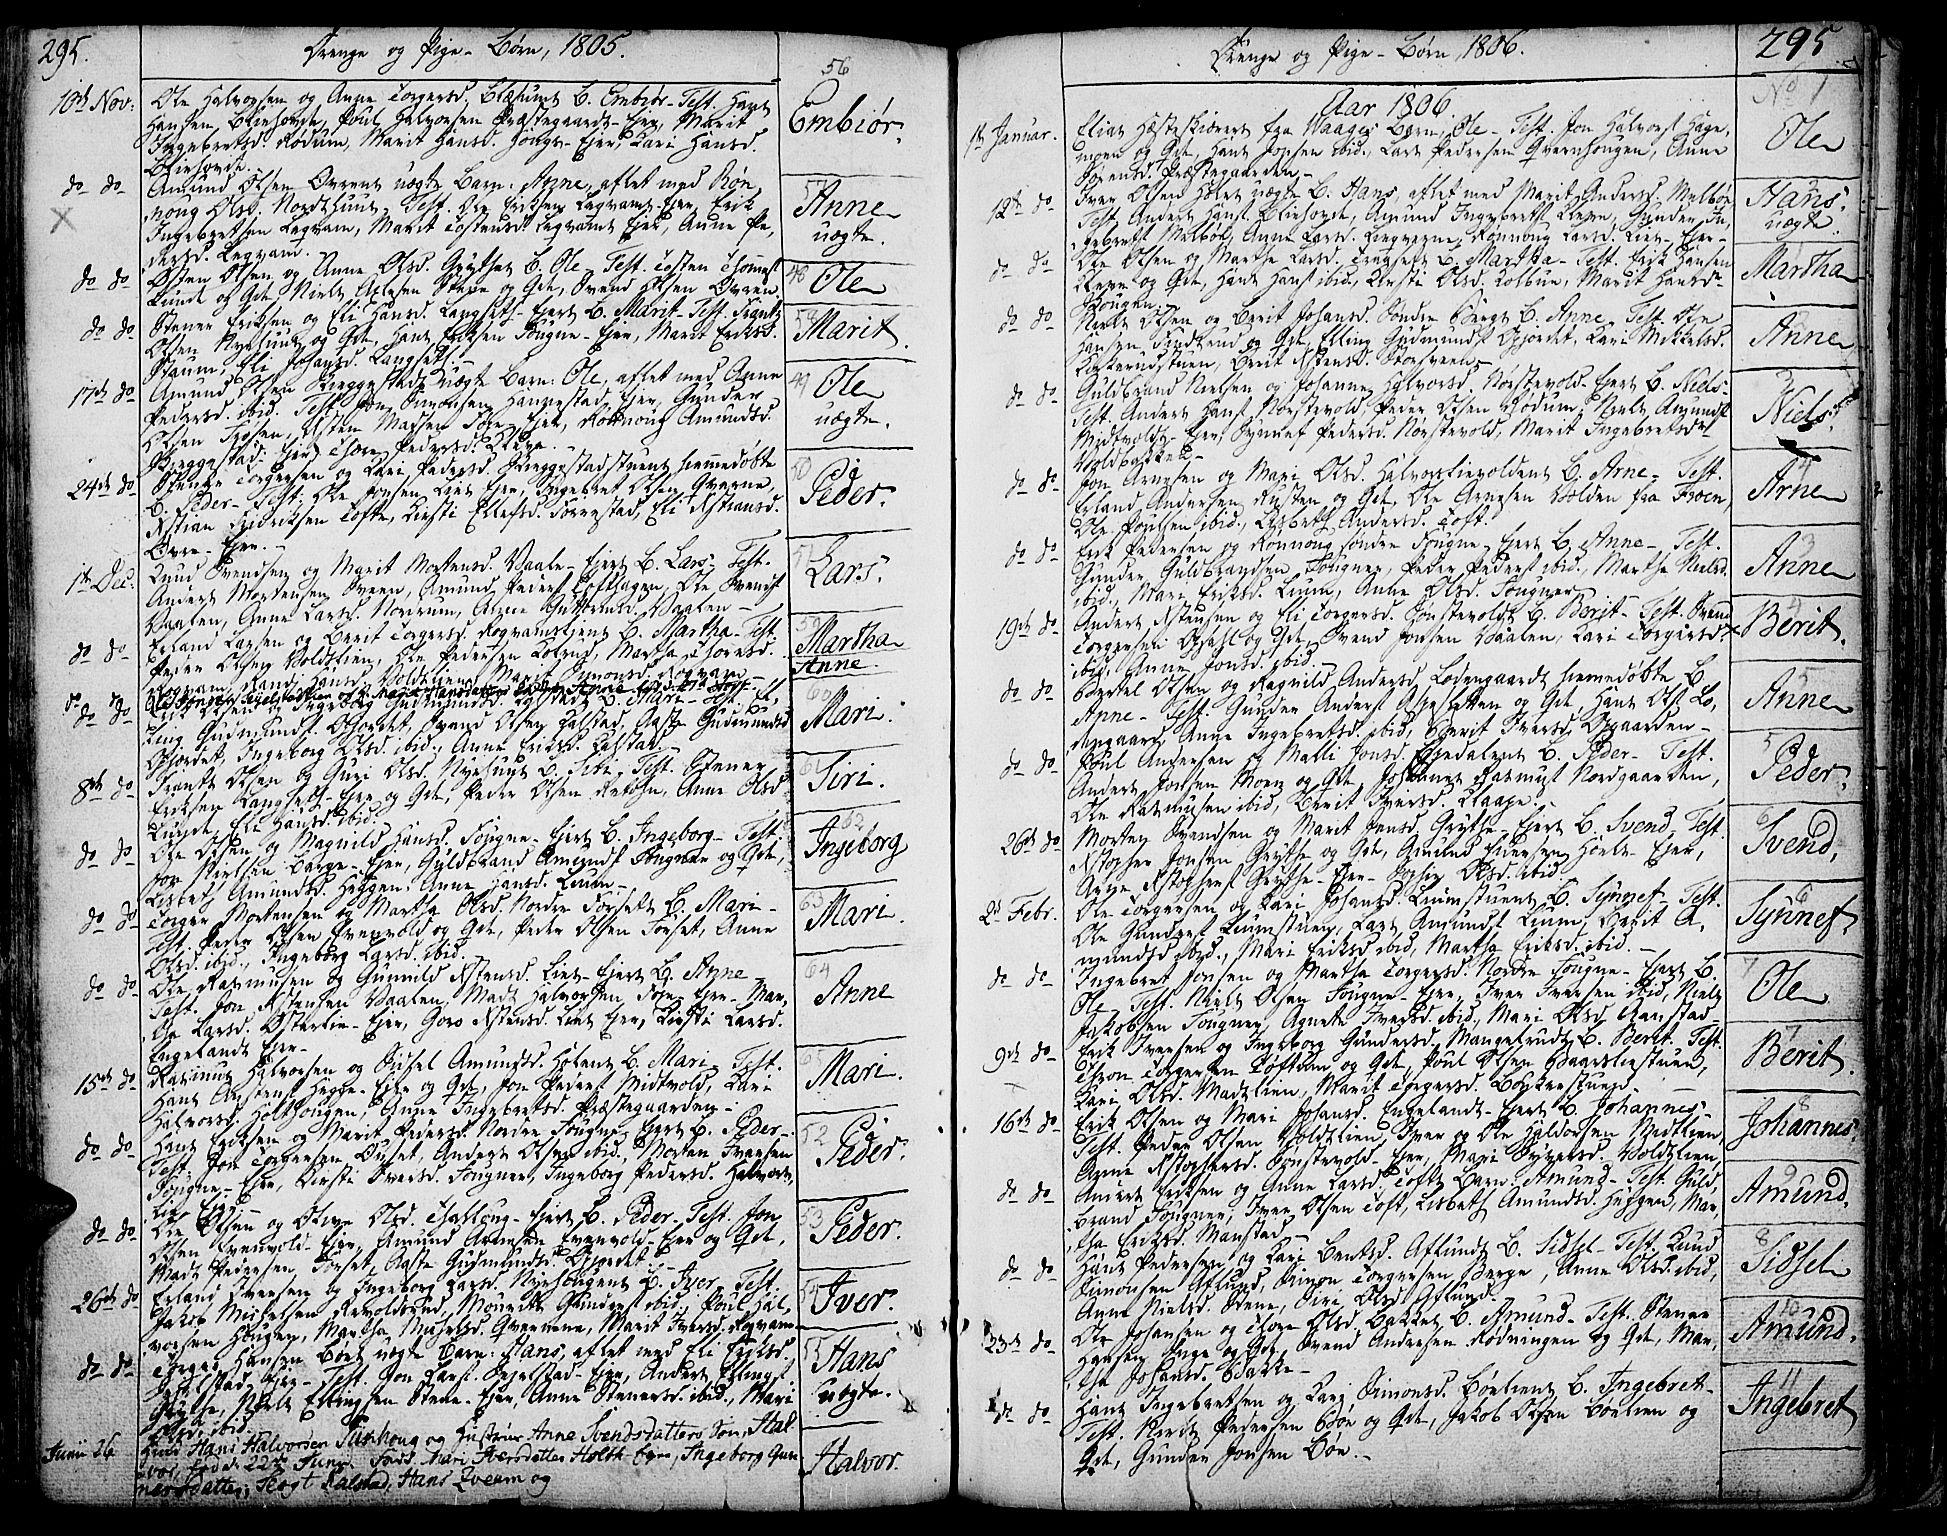 SAH, Gausdal prestekontor, Ministerialbok nr. 3, 1758-1809, s. 295